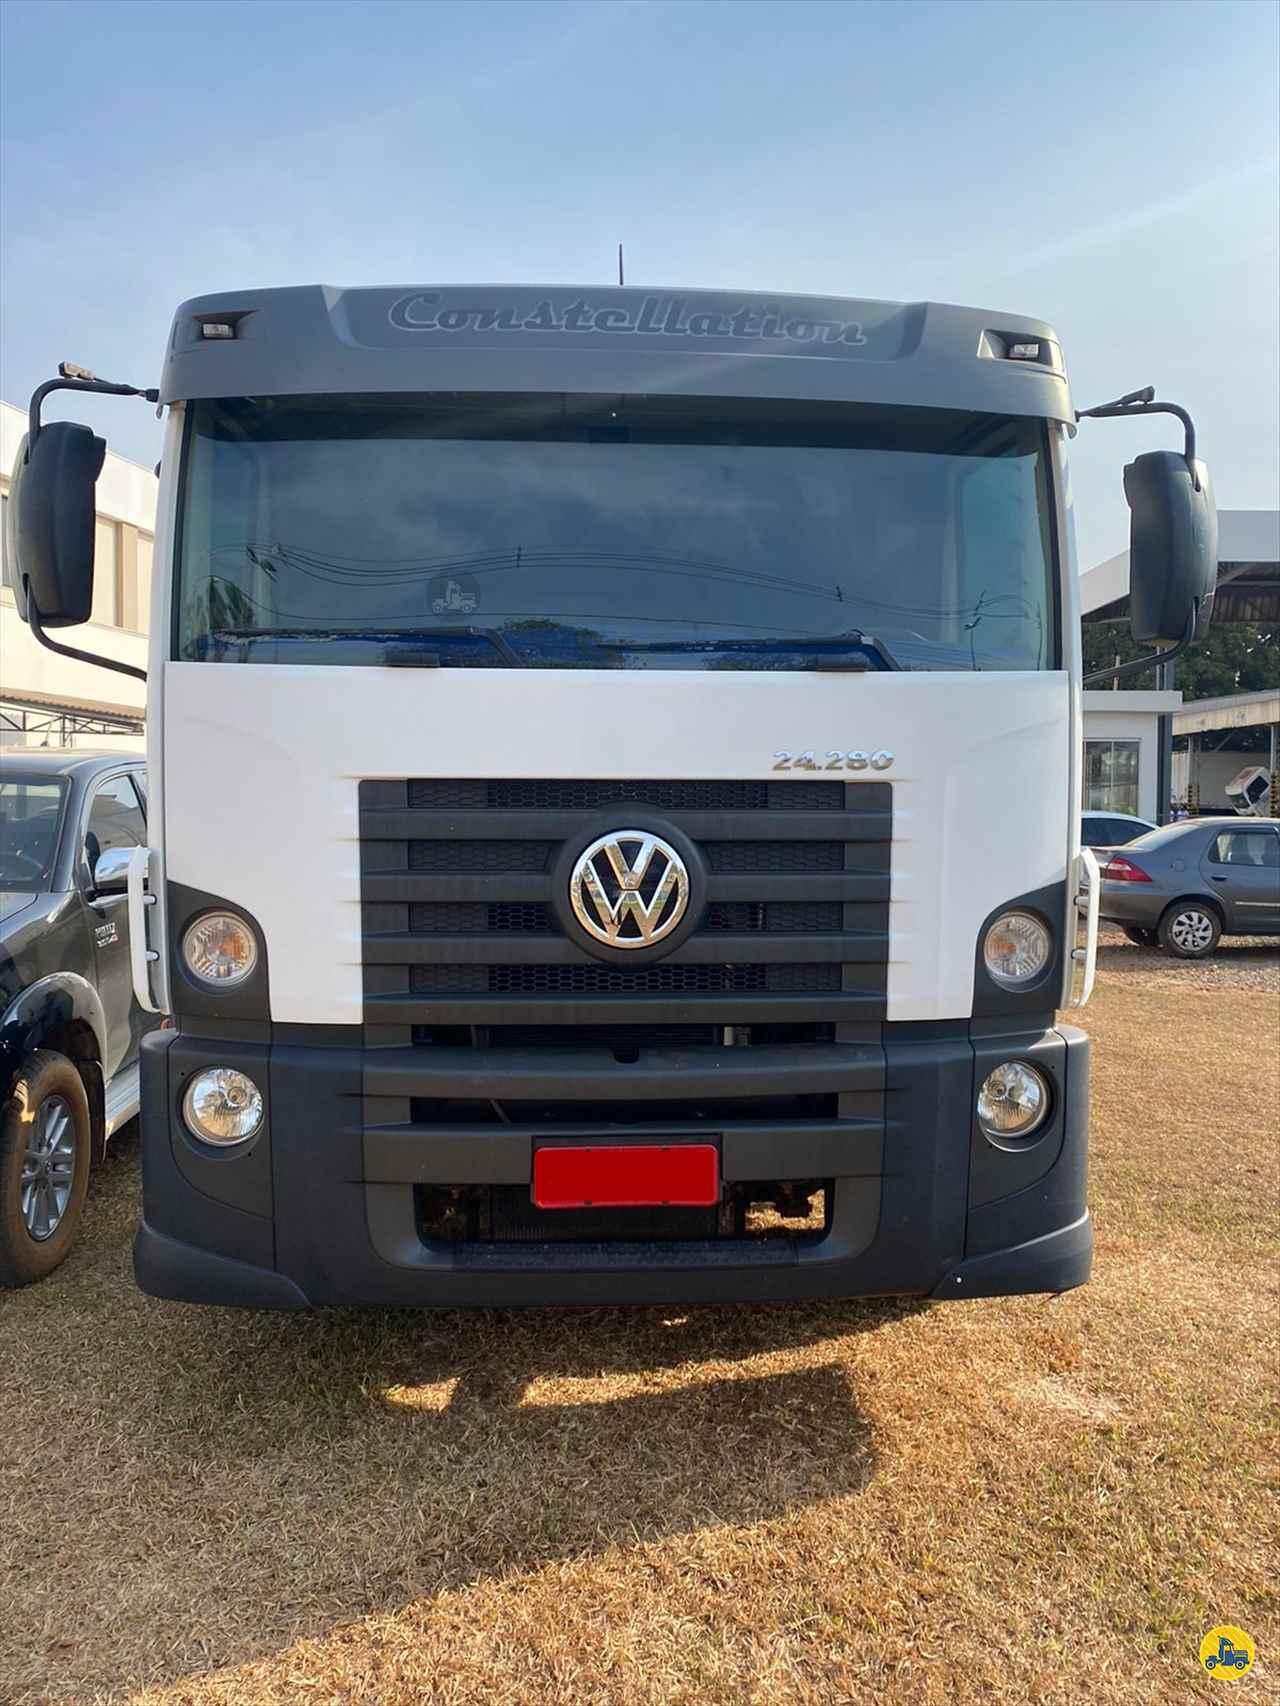 CAMINHAO VOLKSWAGEN VW 24280 Tanque Aço Truck 6x2 AutoPatos - VW PATOS DE MINAS MINAS GERAIS MG